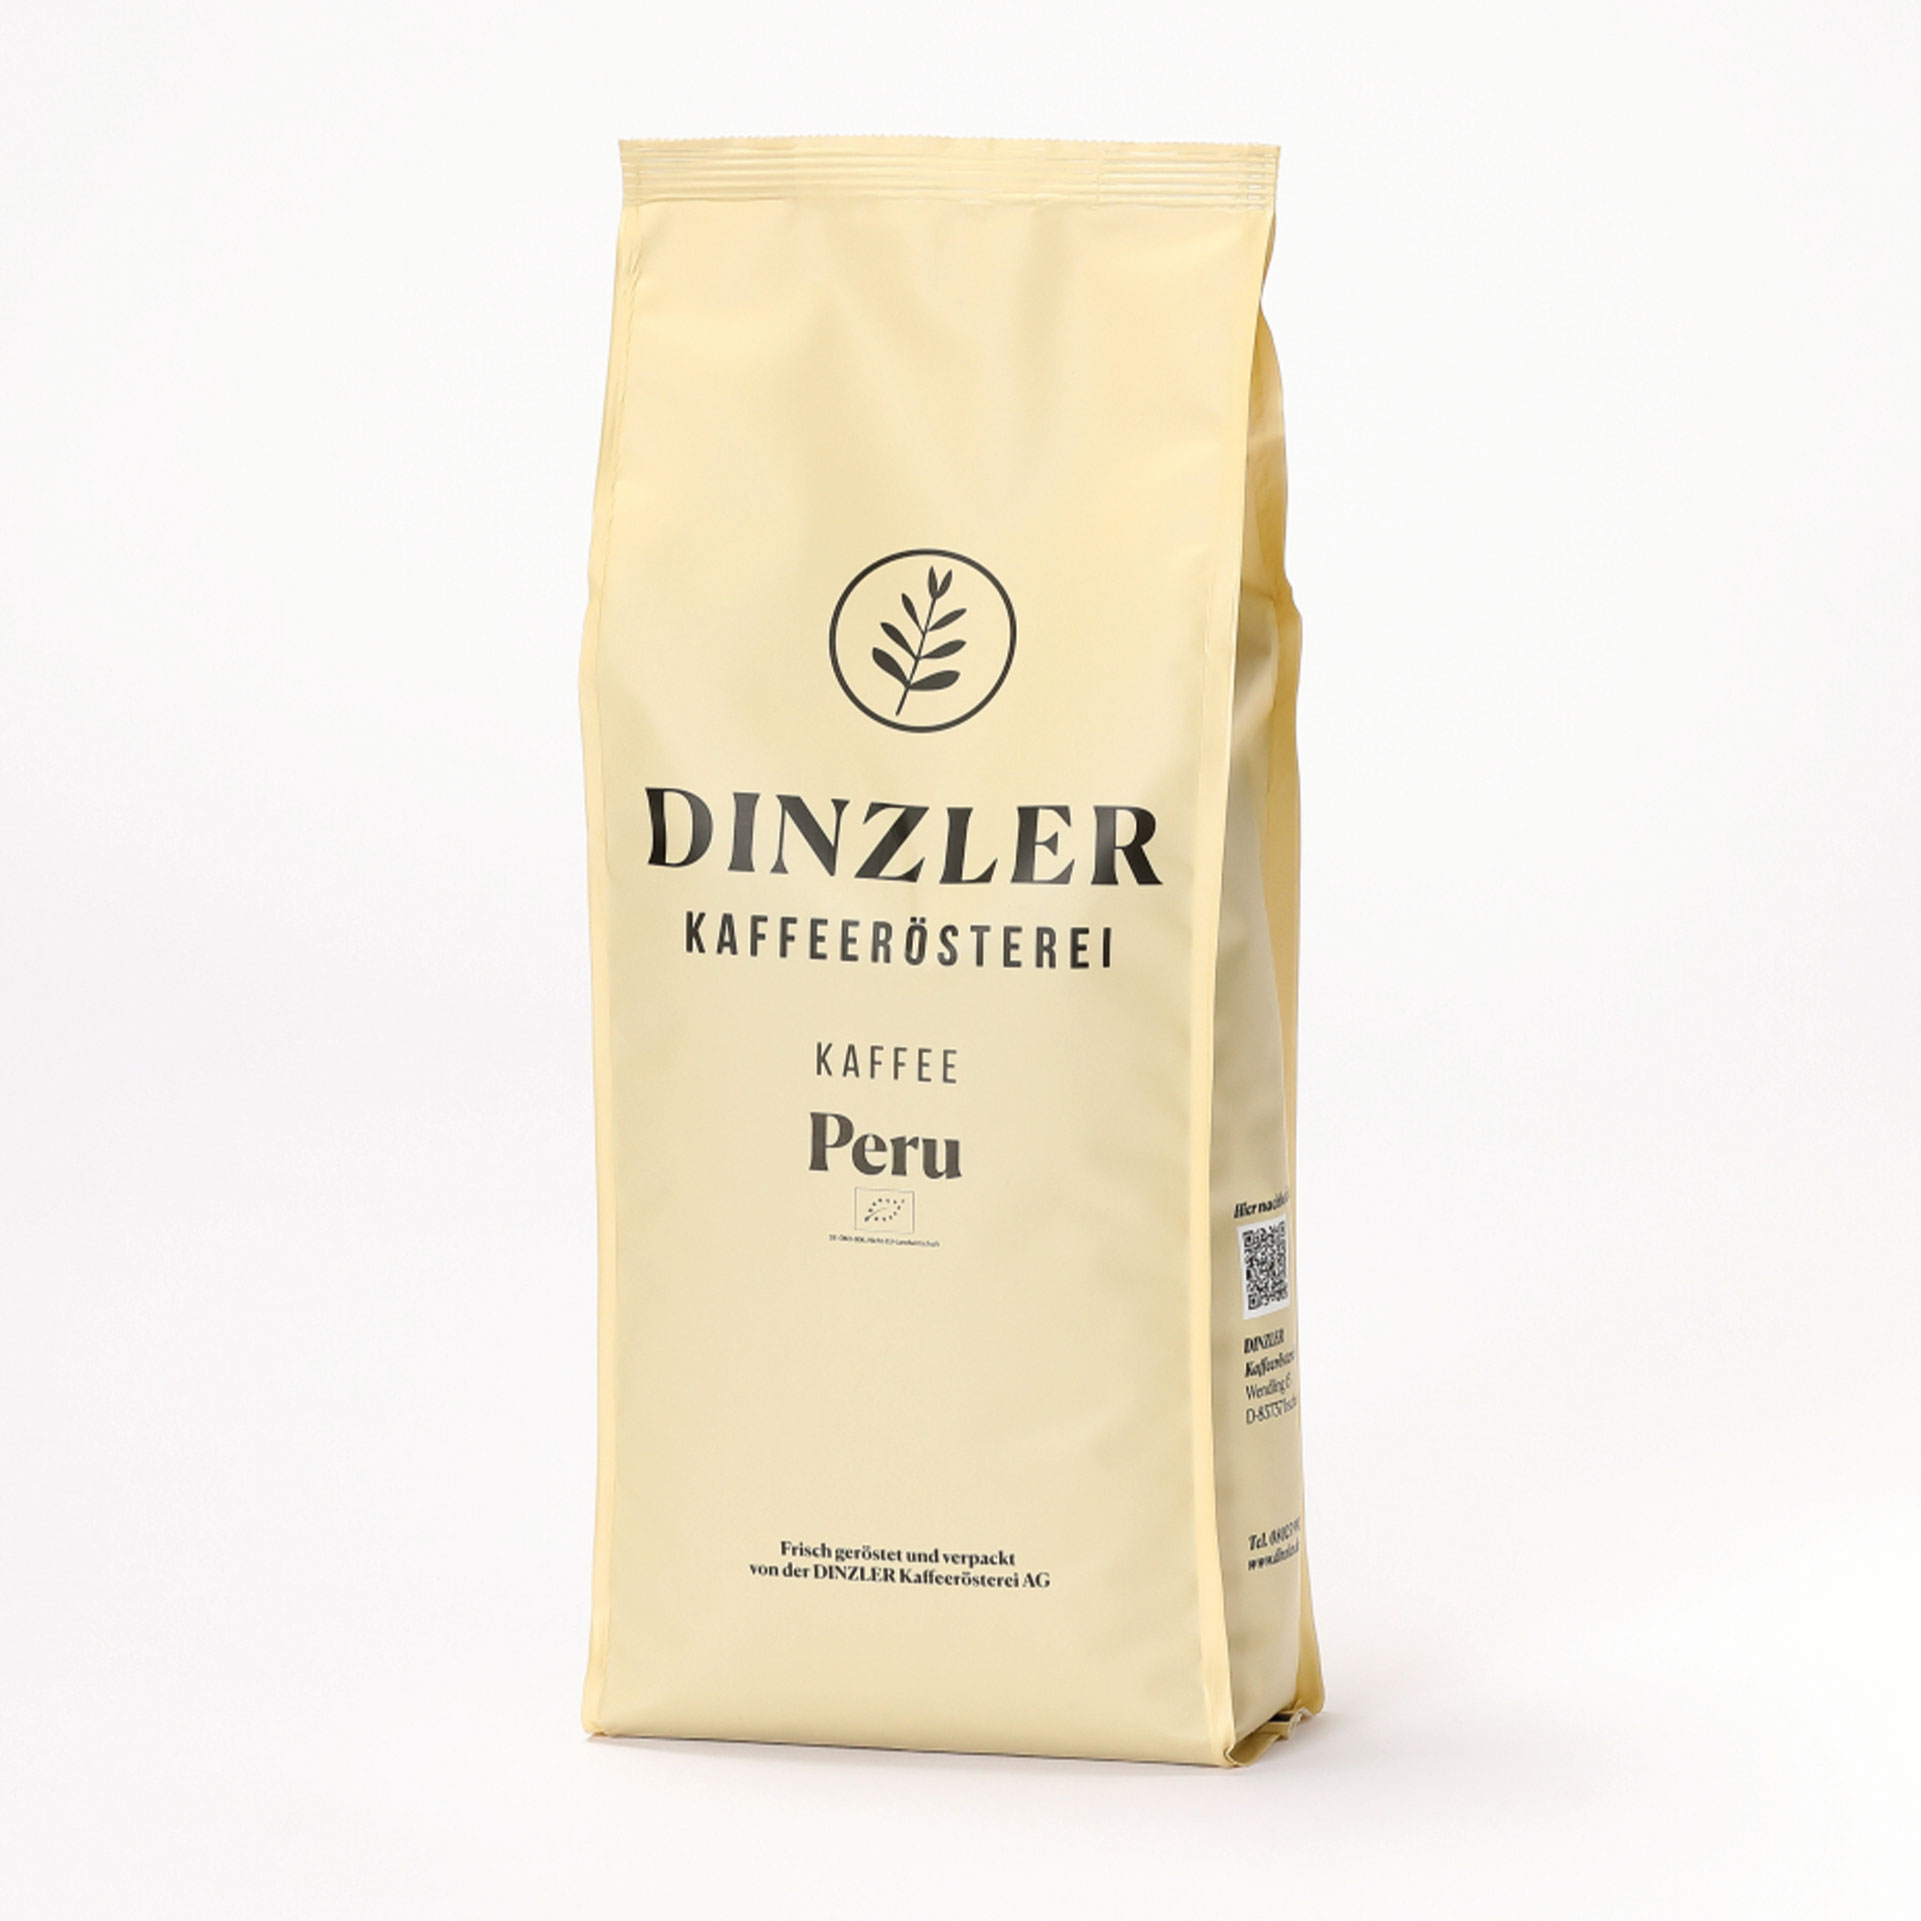 DINZLER Kaffee Peru